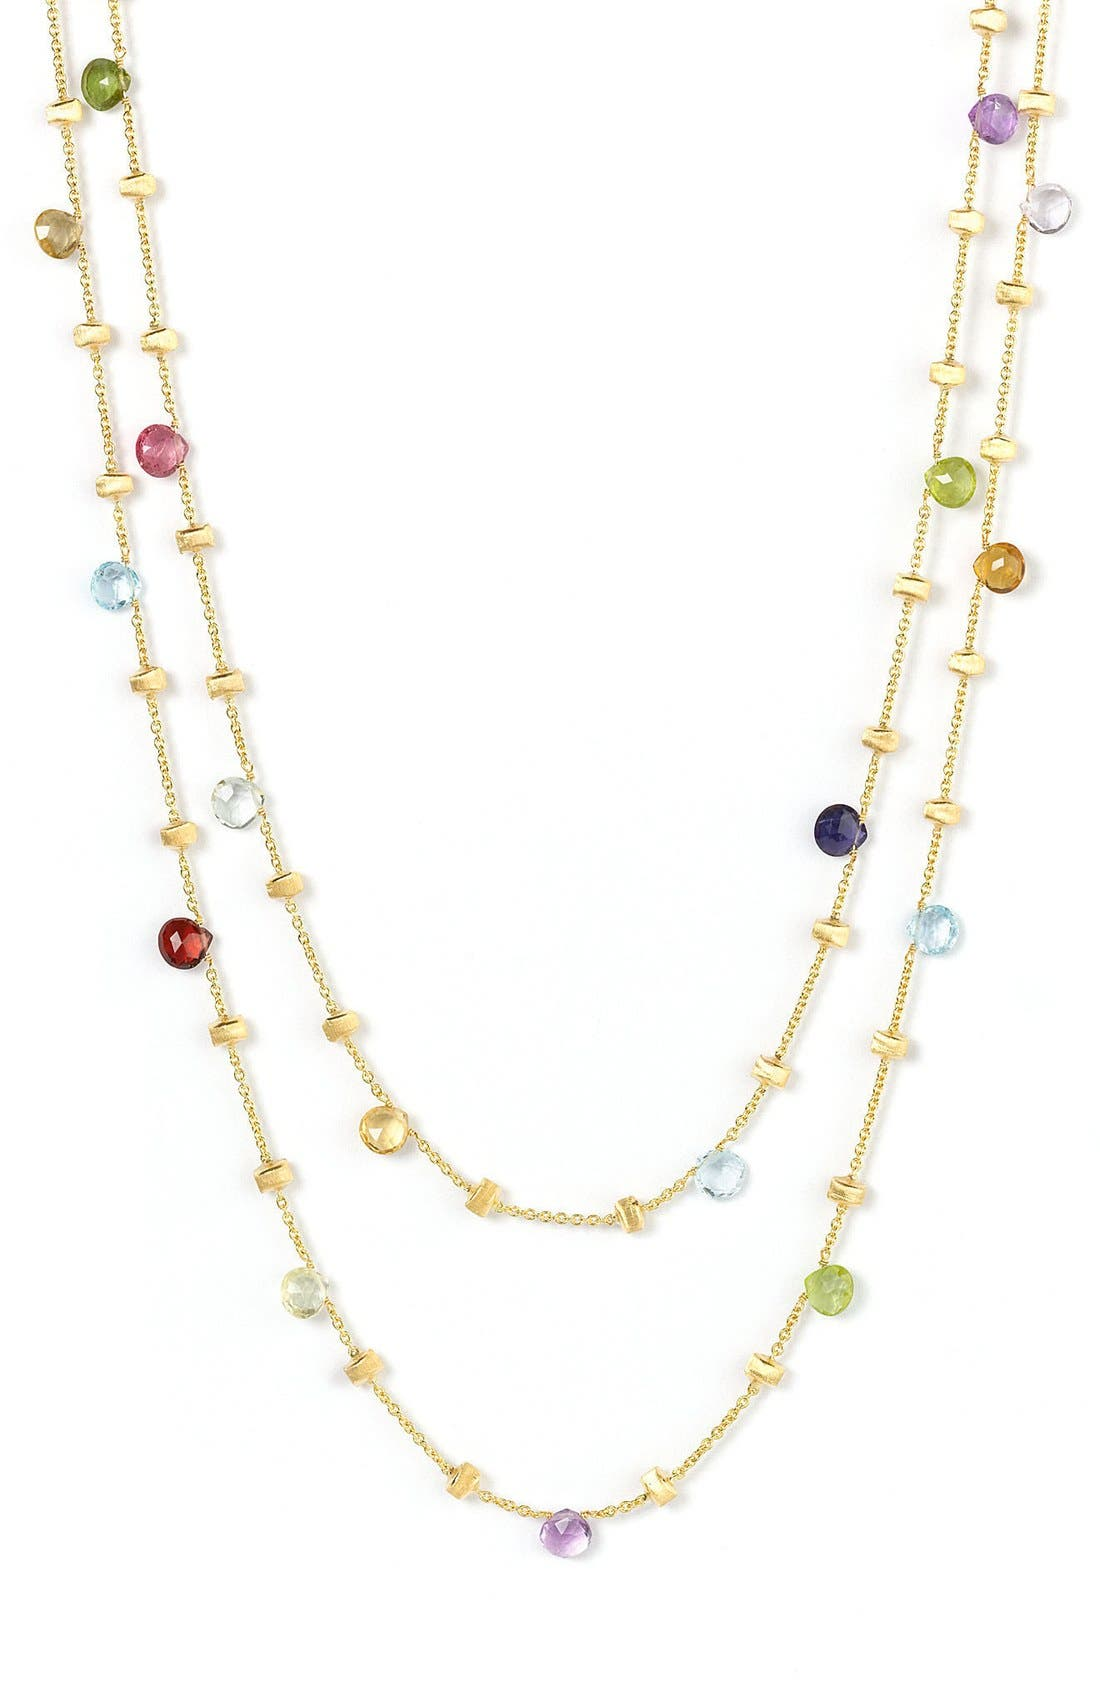 'Paradise' Semiprecious Stone Long Necklace,                             Alternate thumbnail 2, color,                             YELLOW GOLD/ MULTI